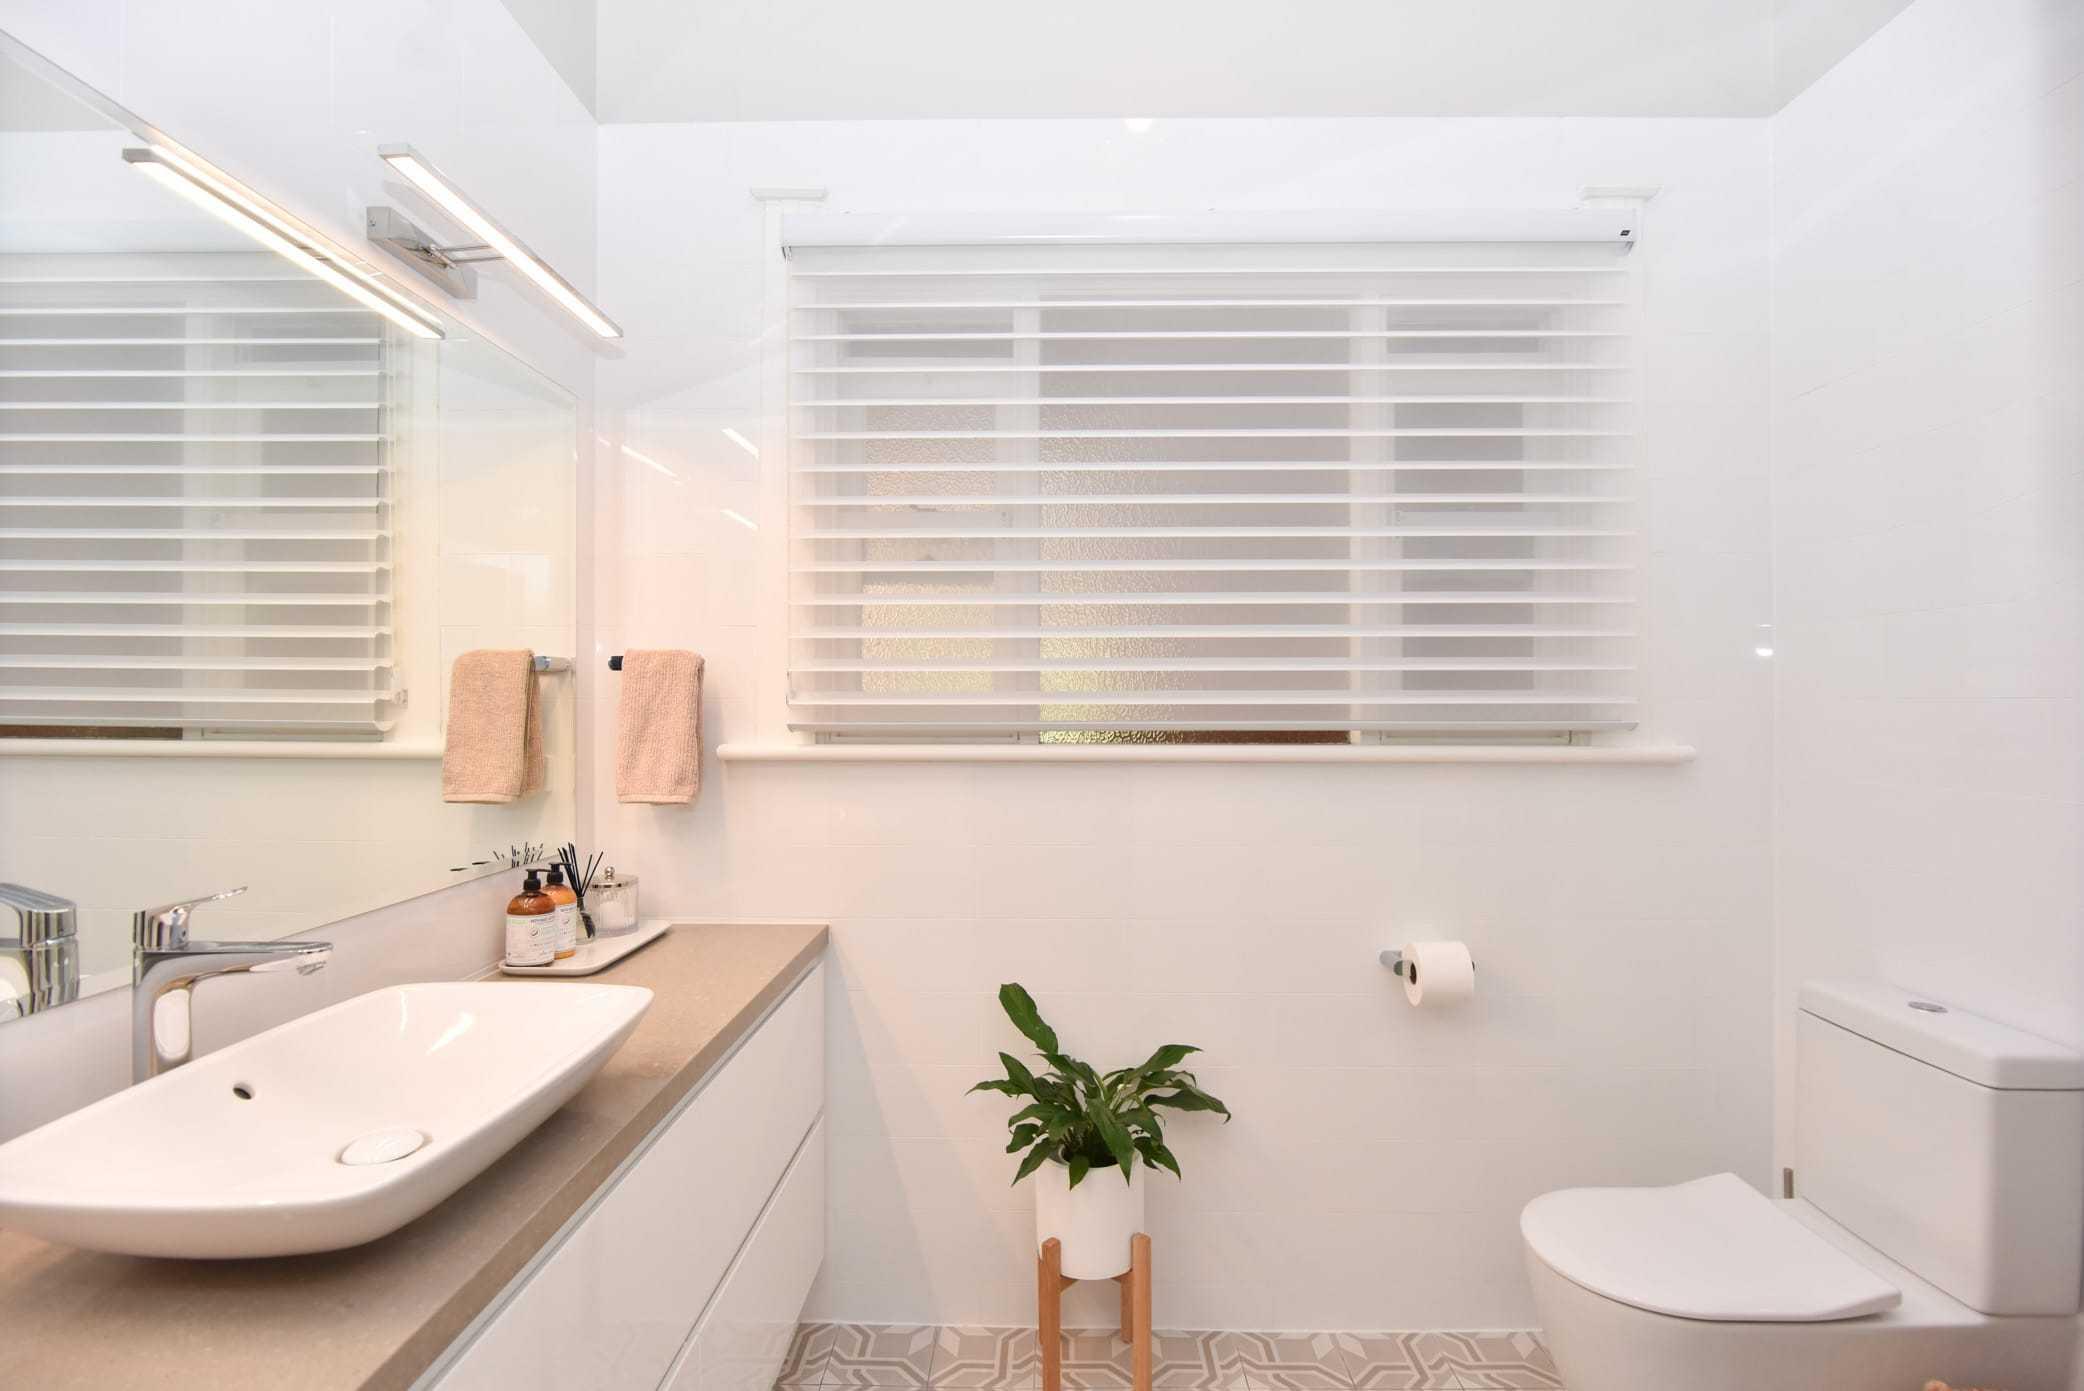 Bathrooms-43.jpg#asset:2307